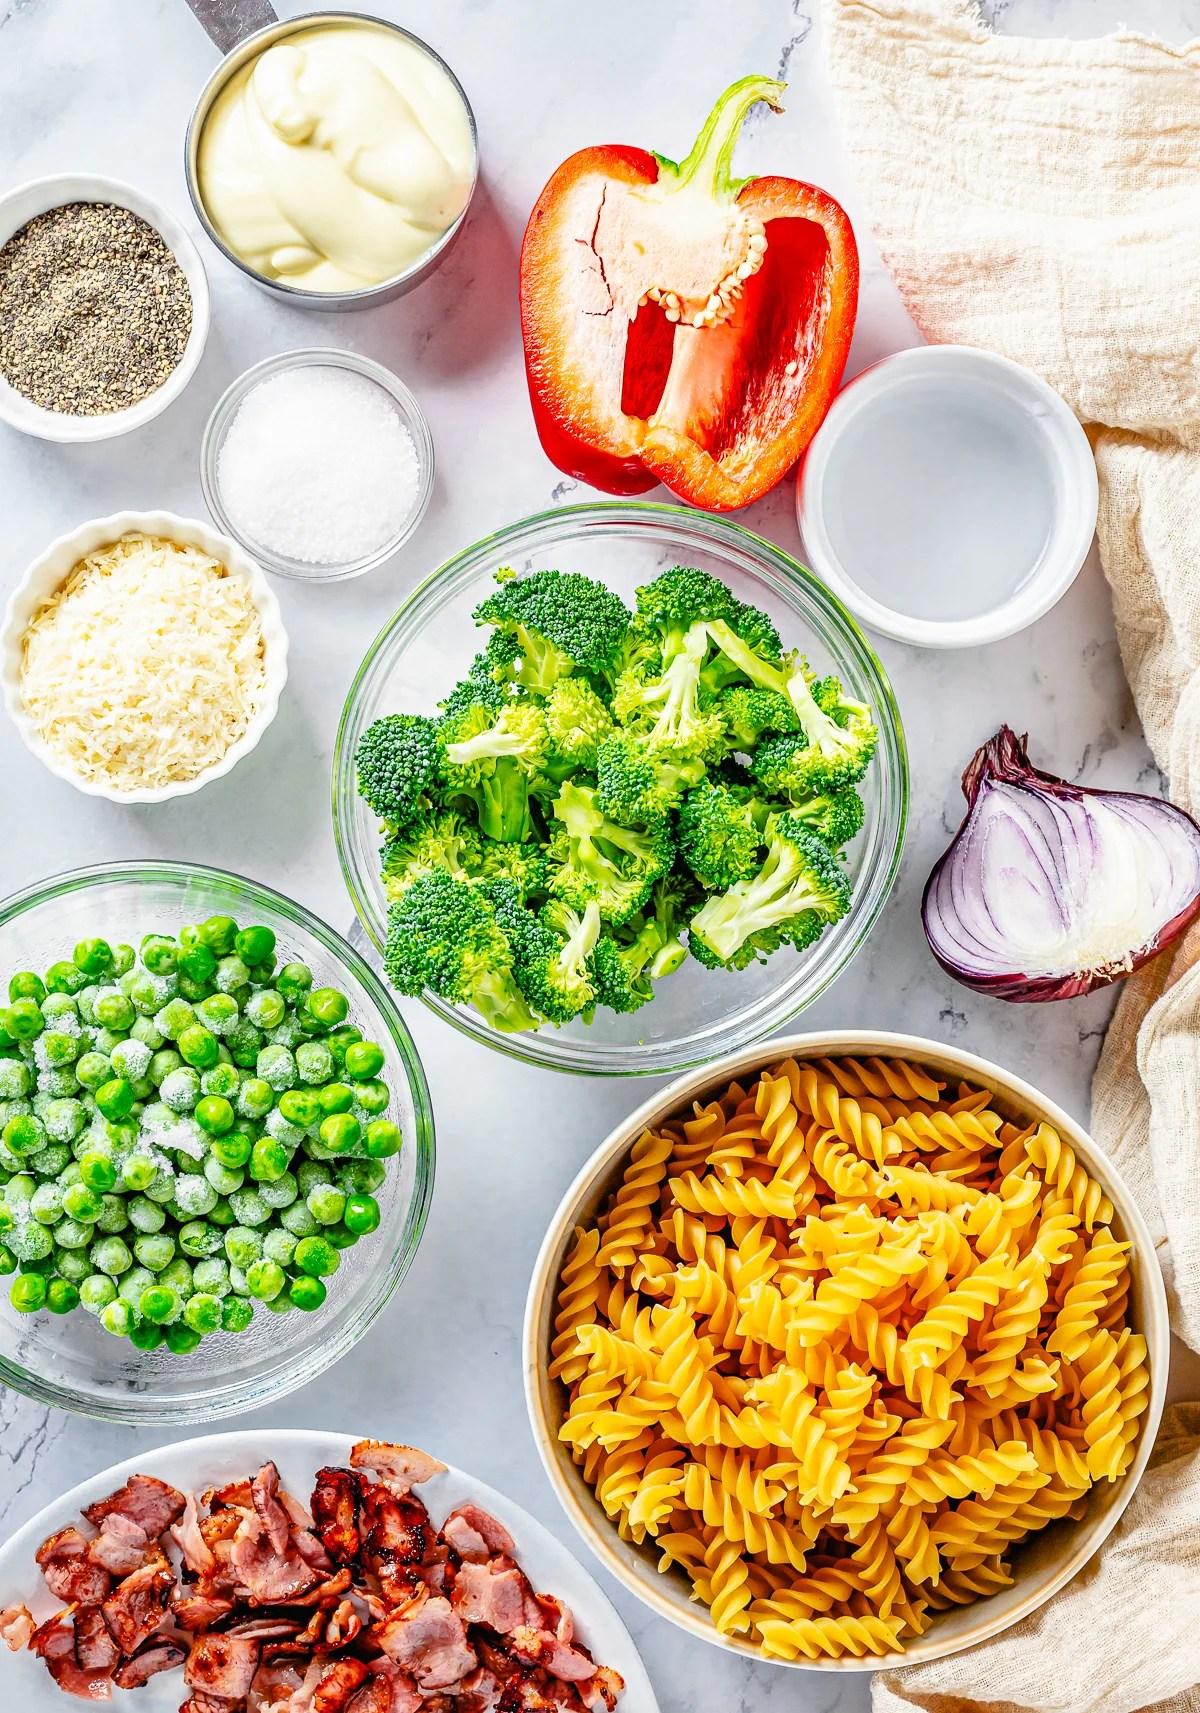 Ingredients needed to make Broccoli Pasta Salad